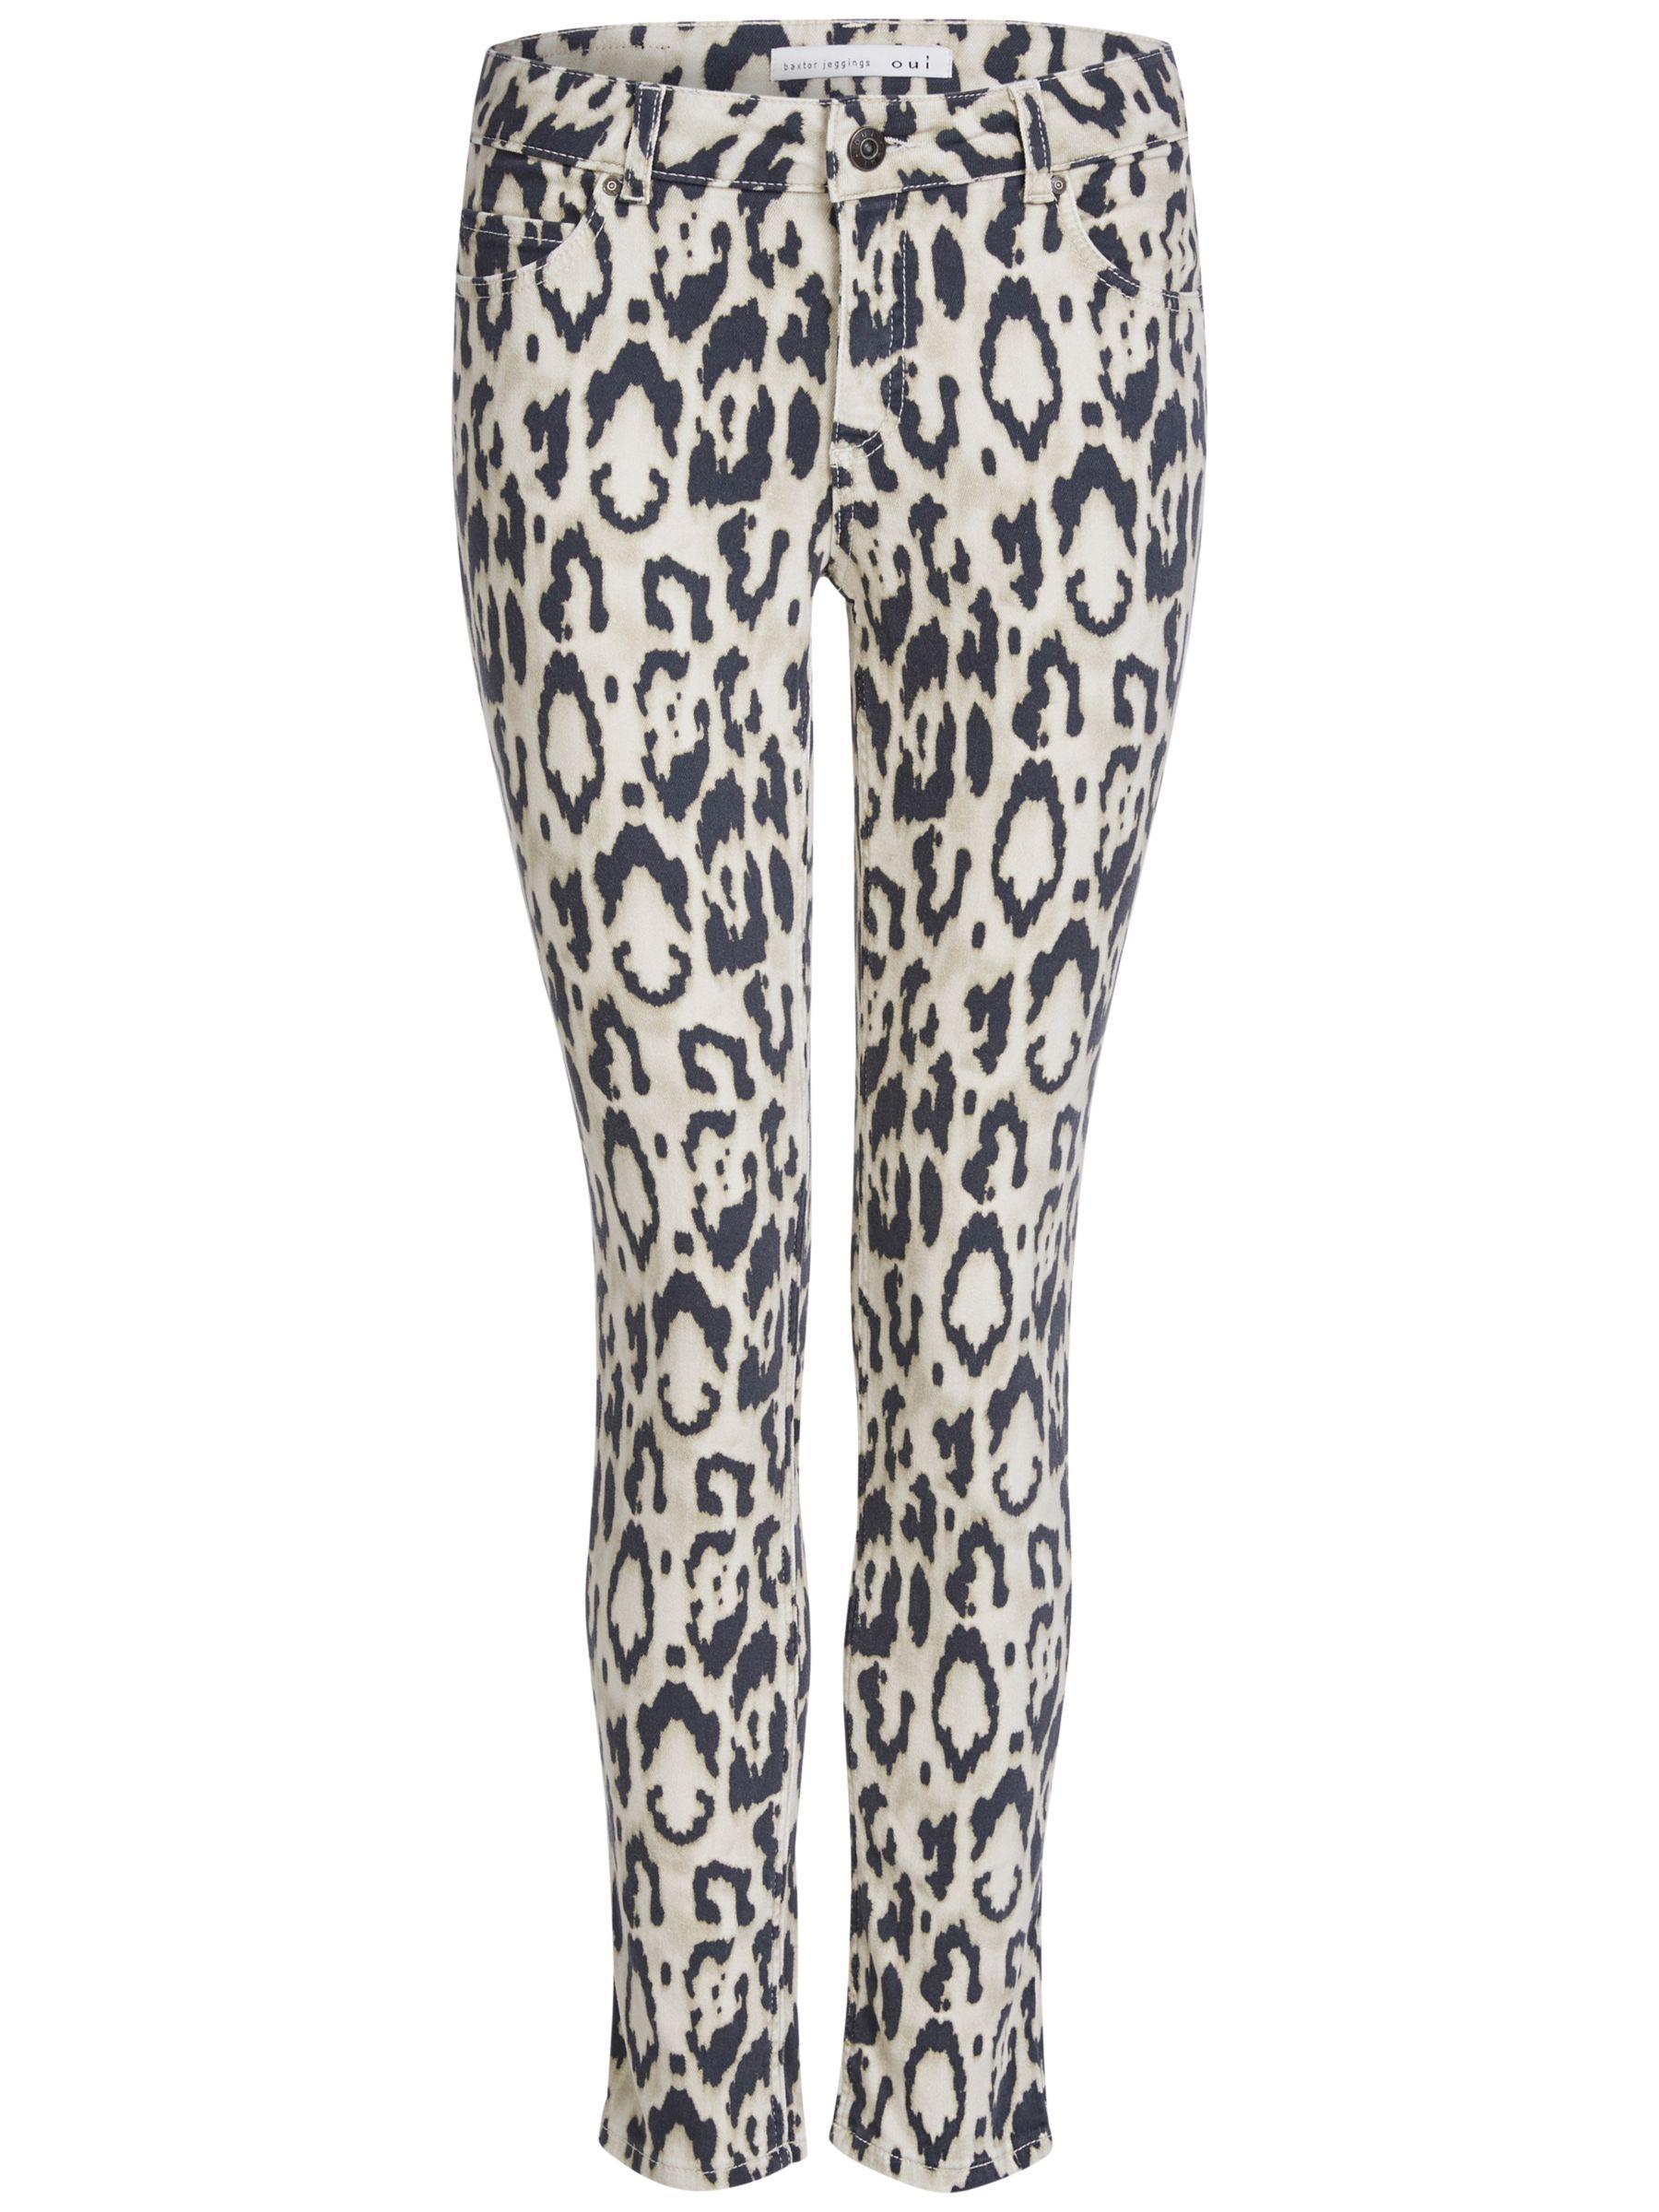 Oui Oui Animal Jeans, Camel Grey